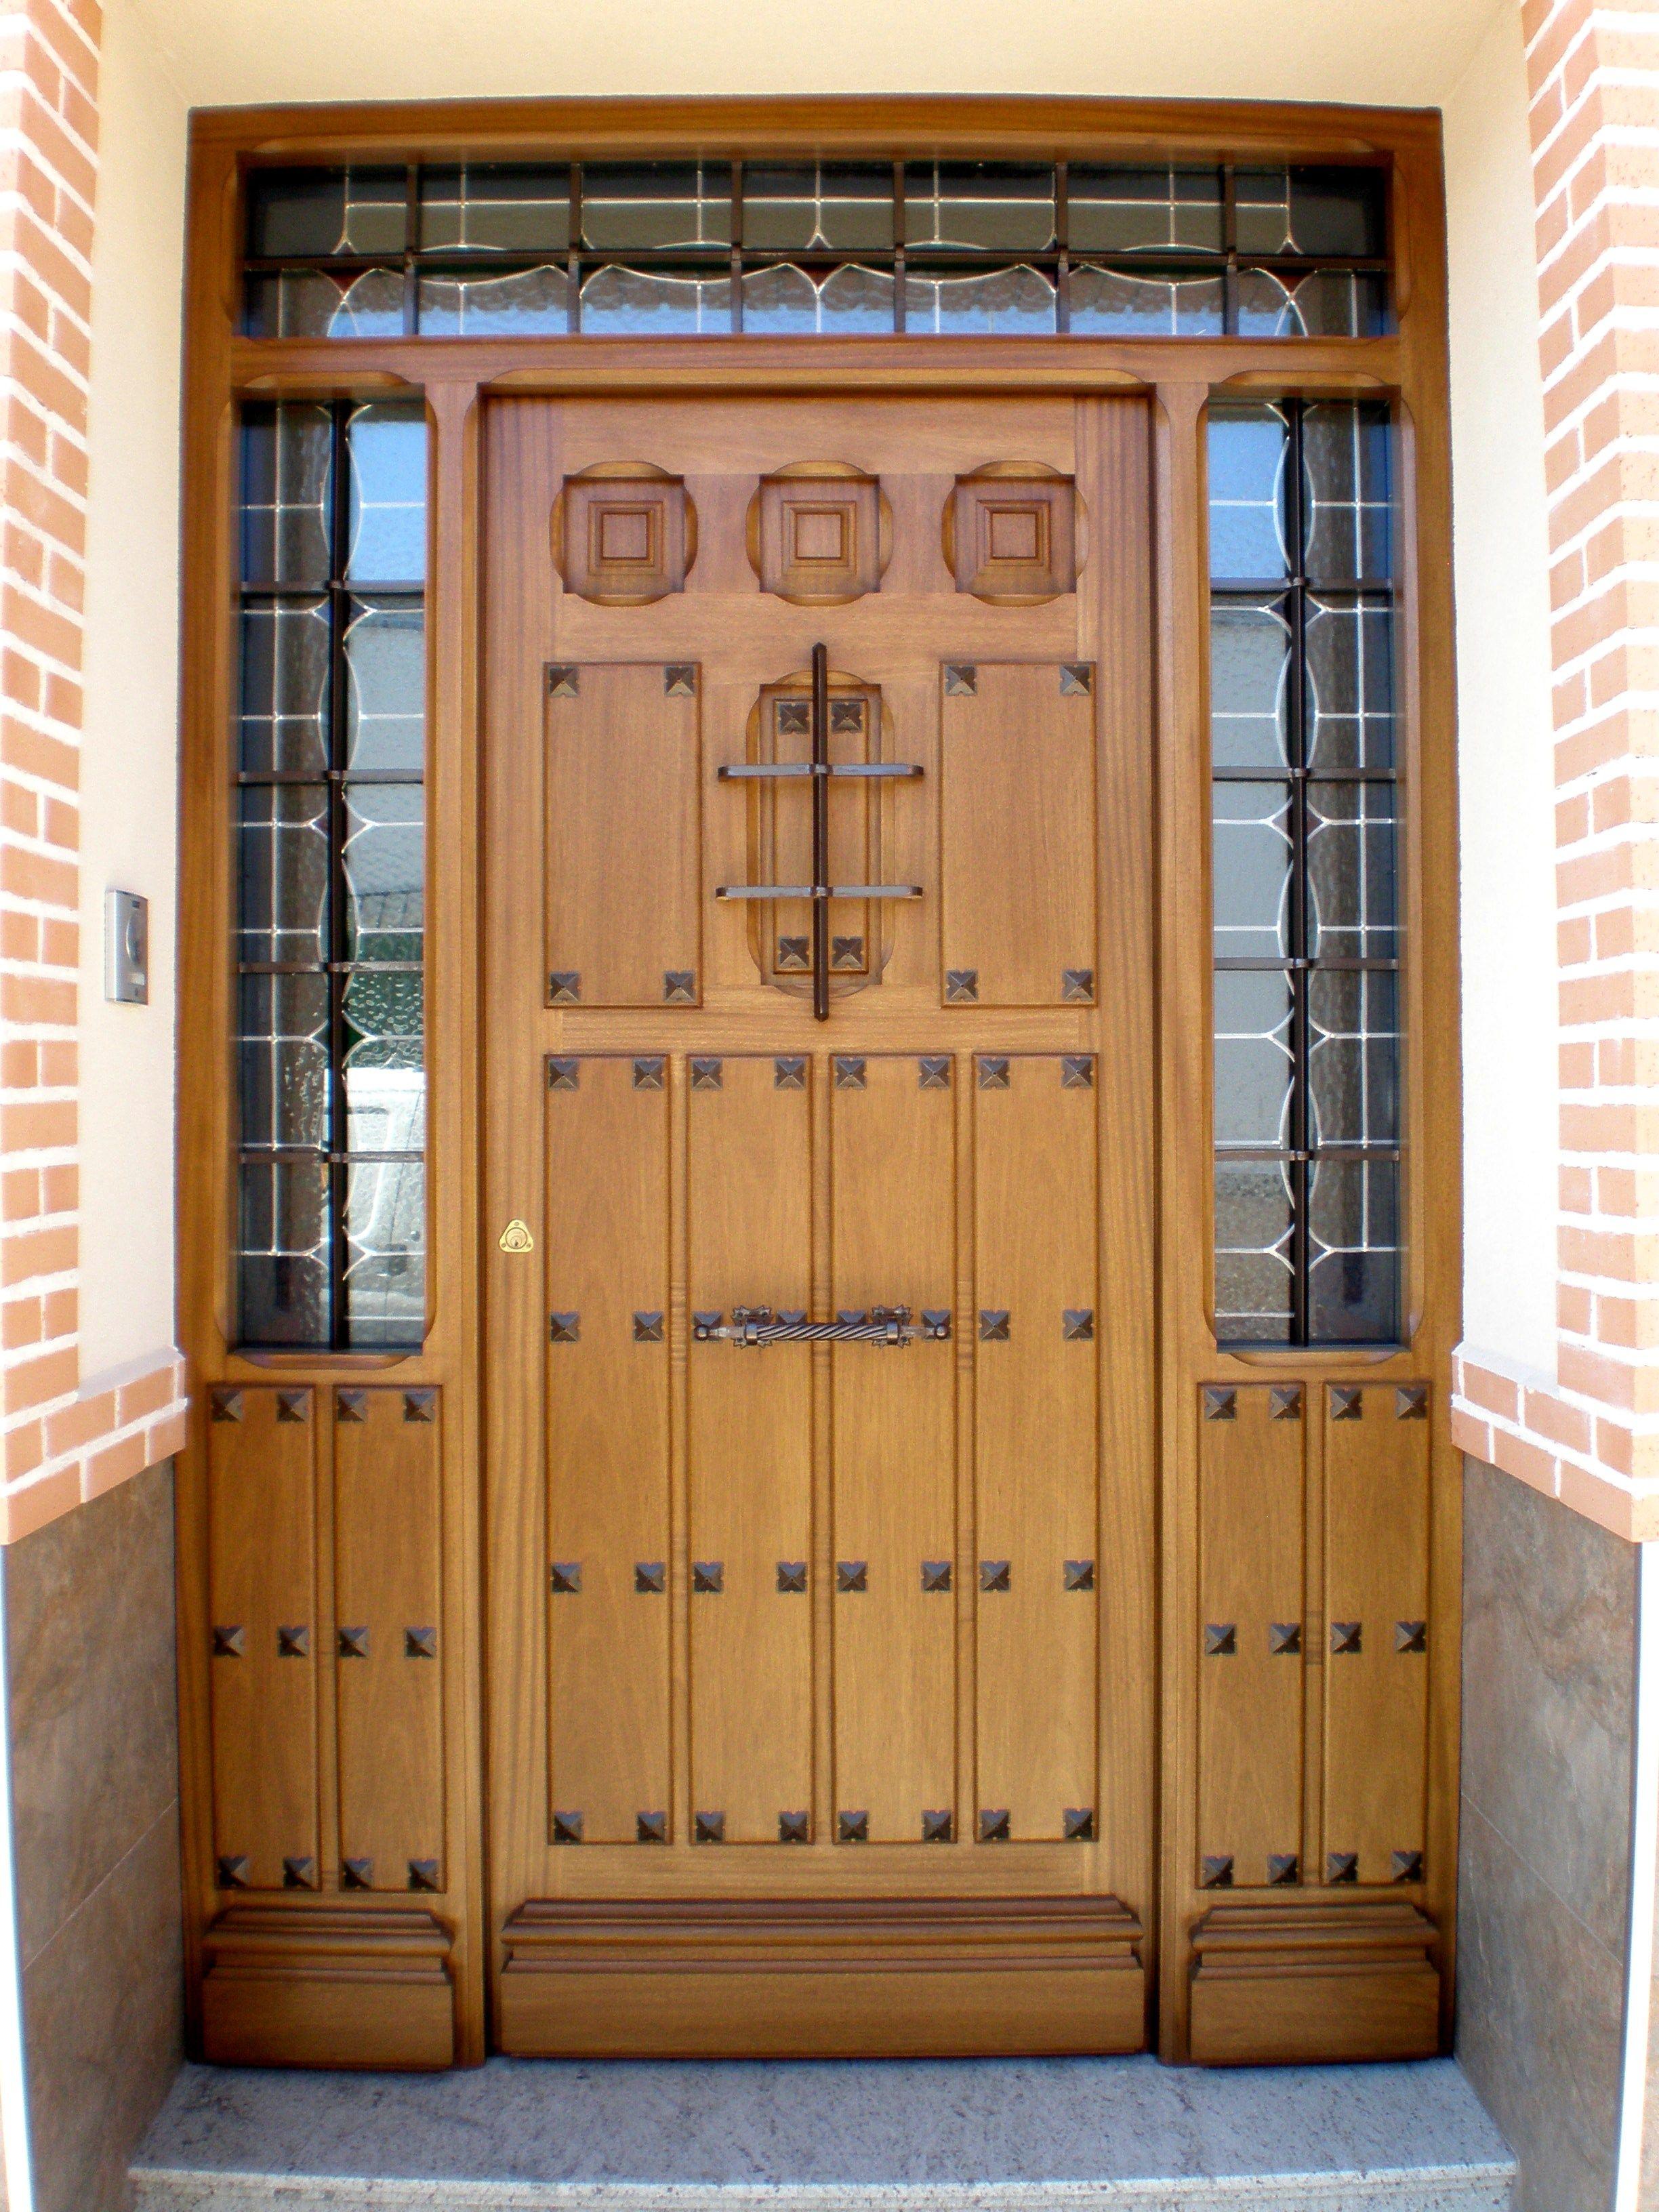 Dise o de puerta rustica ideal para casa rural trabajos en madera pinterest doors - Puertas de madera exterior rusticas ...